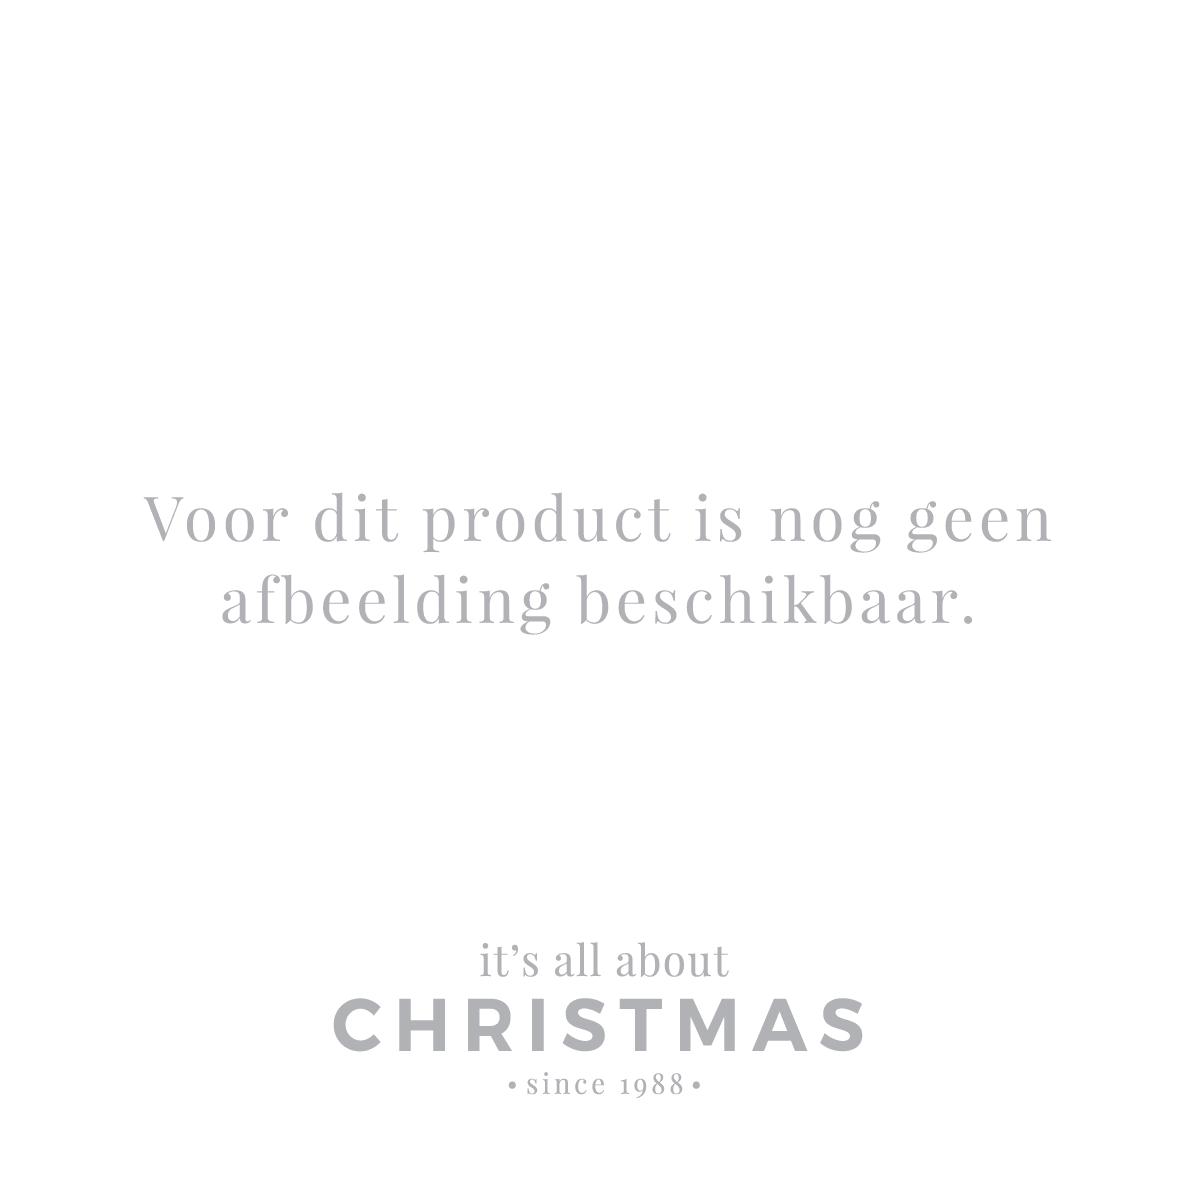 12 shatterproof Christmas baubles silver 6 cm